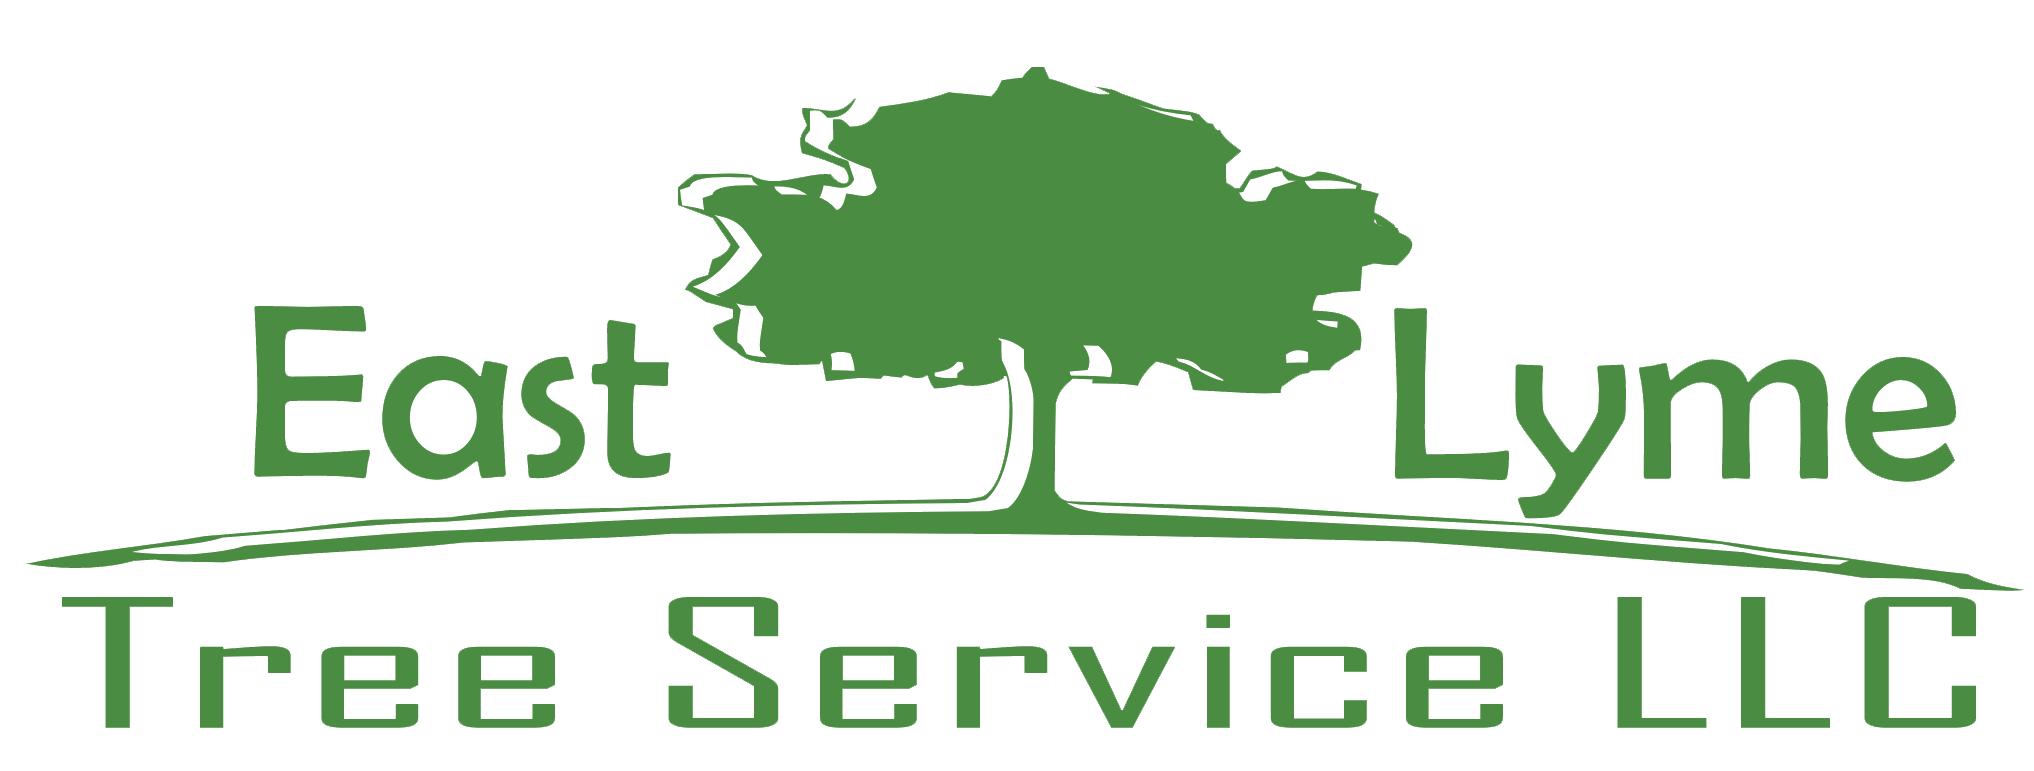 East Lyme Tree Service